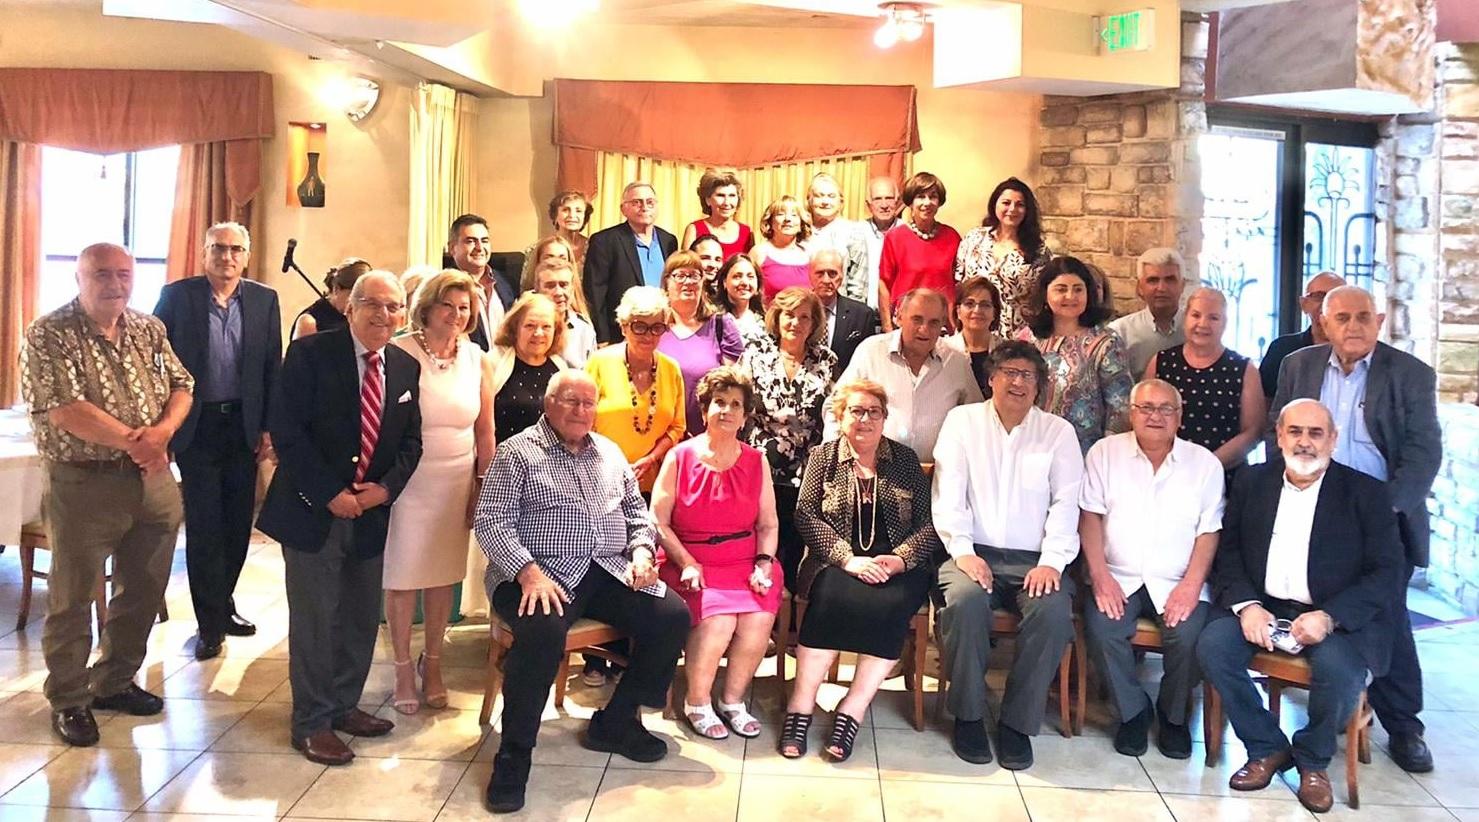 The Iraqi Armenian Family Association of LA Hosts Fundraiser for Family and Community NGO of Armenia